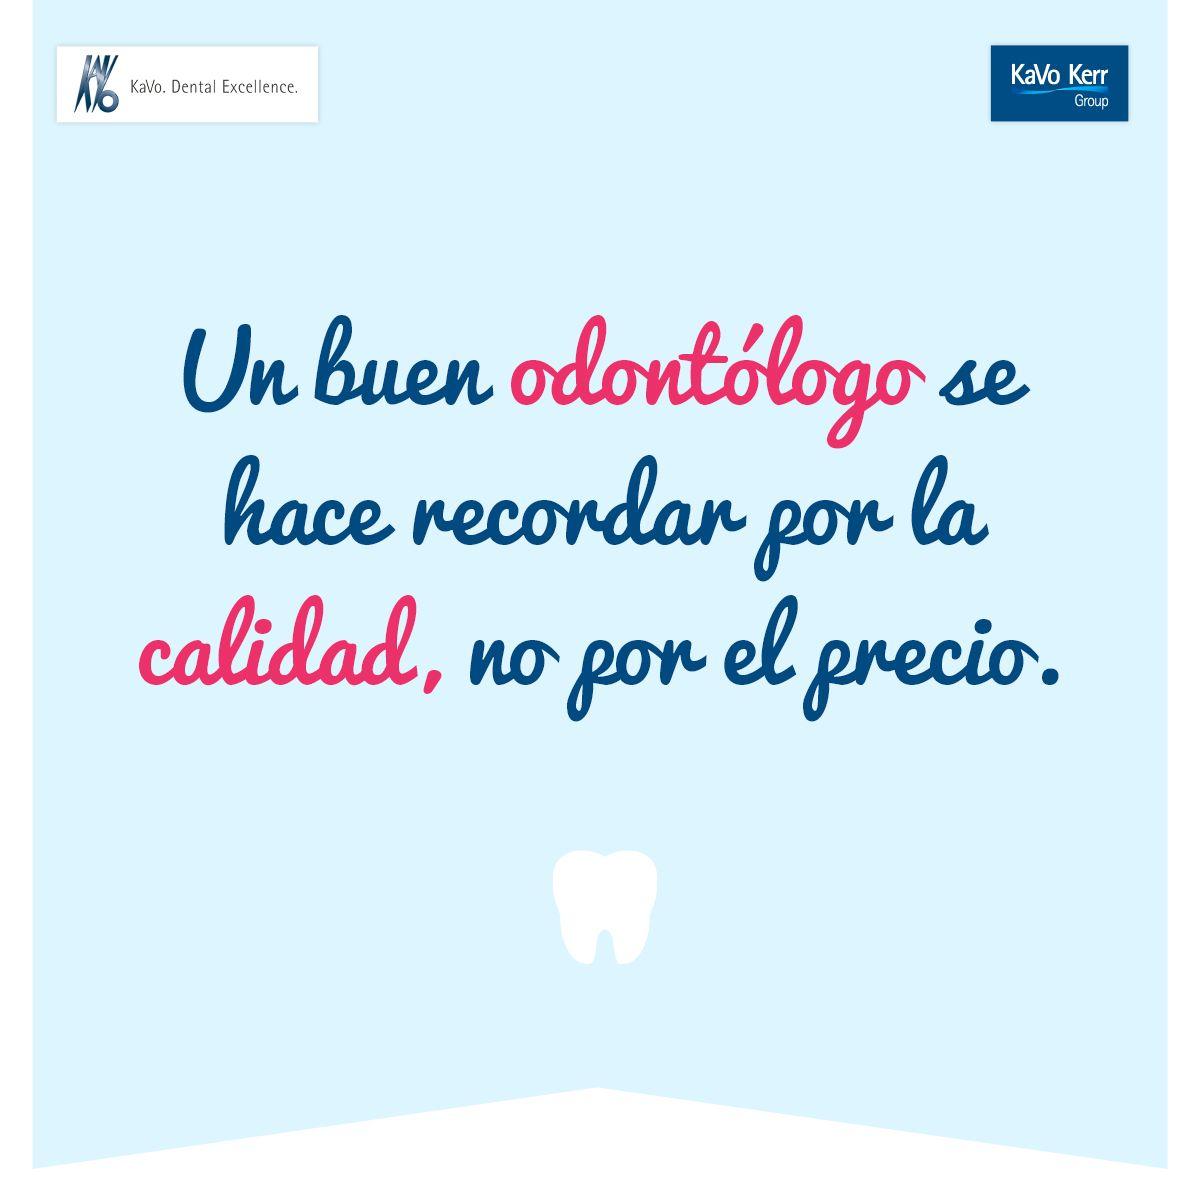 Odontología Frase Kavomx Odontólogo Ortodoncia Dental